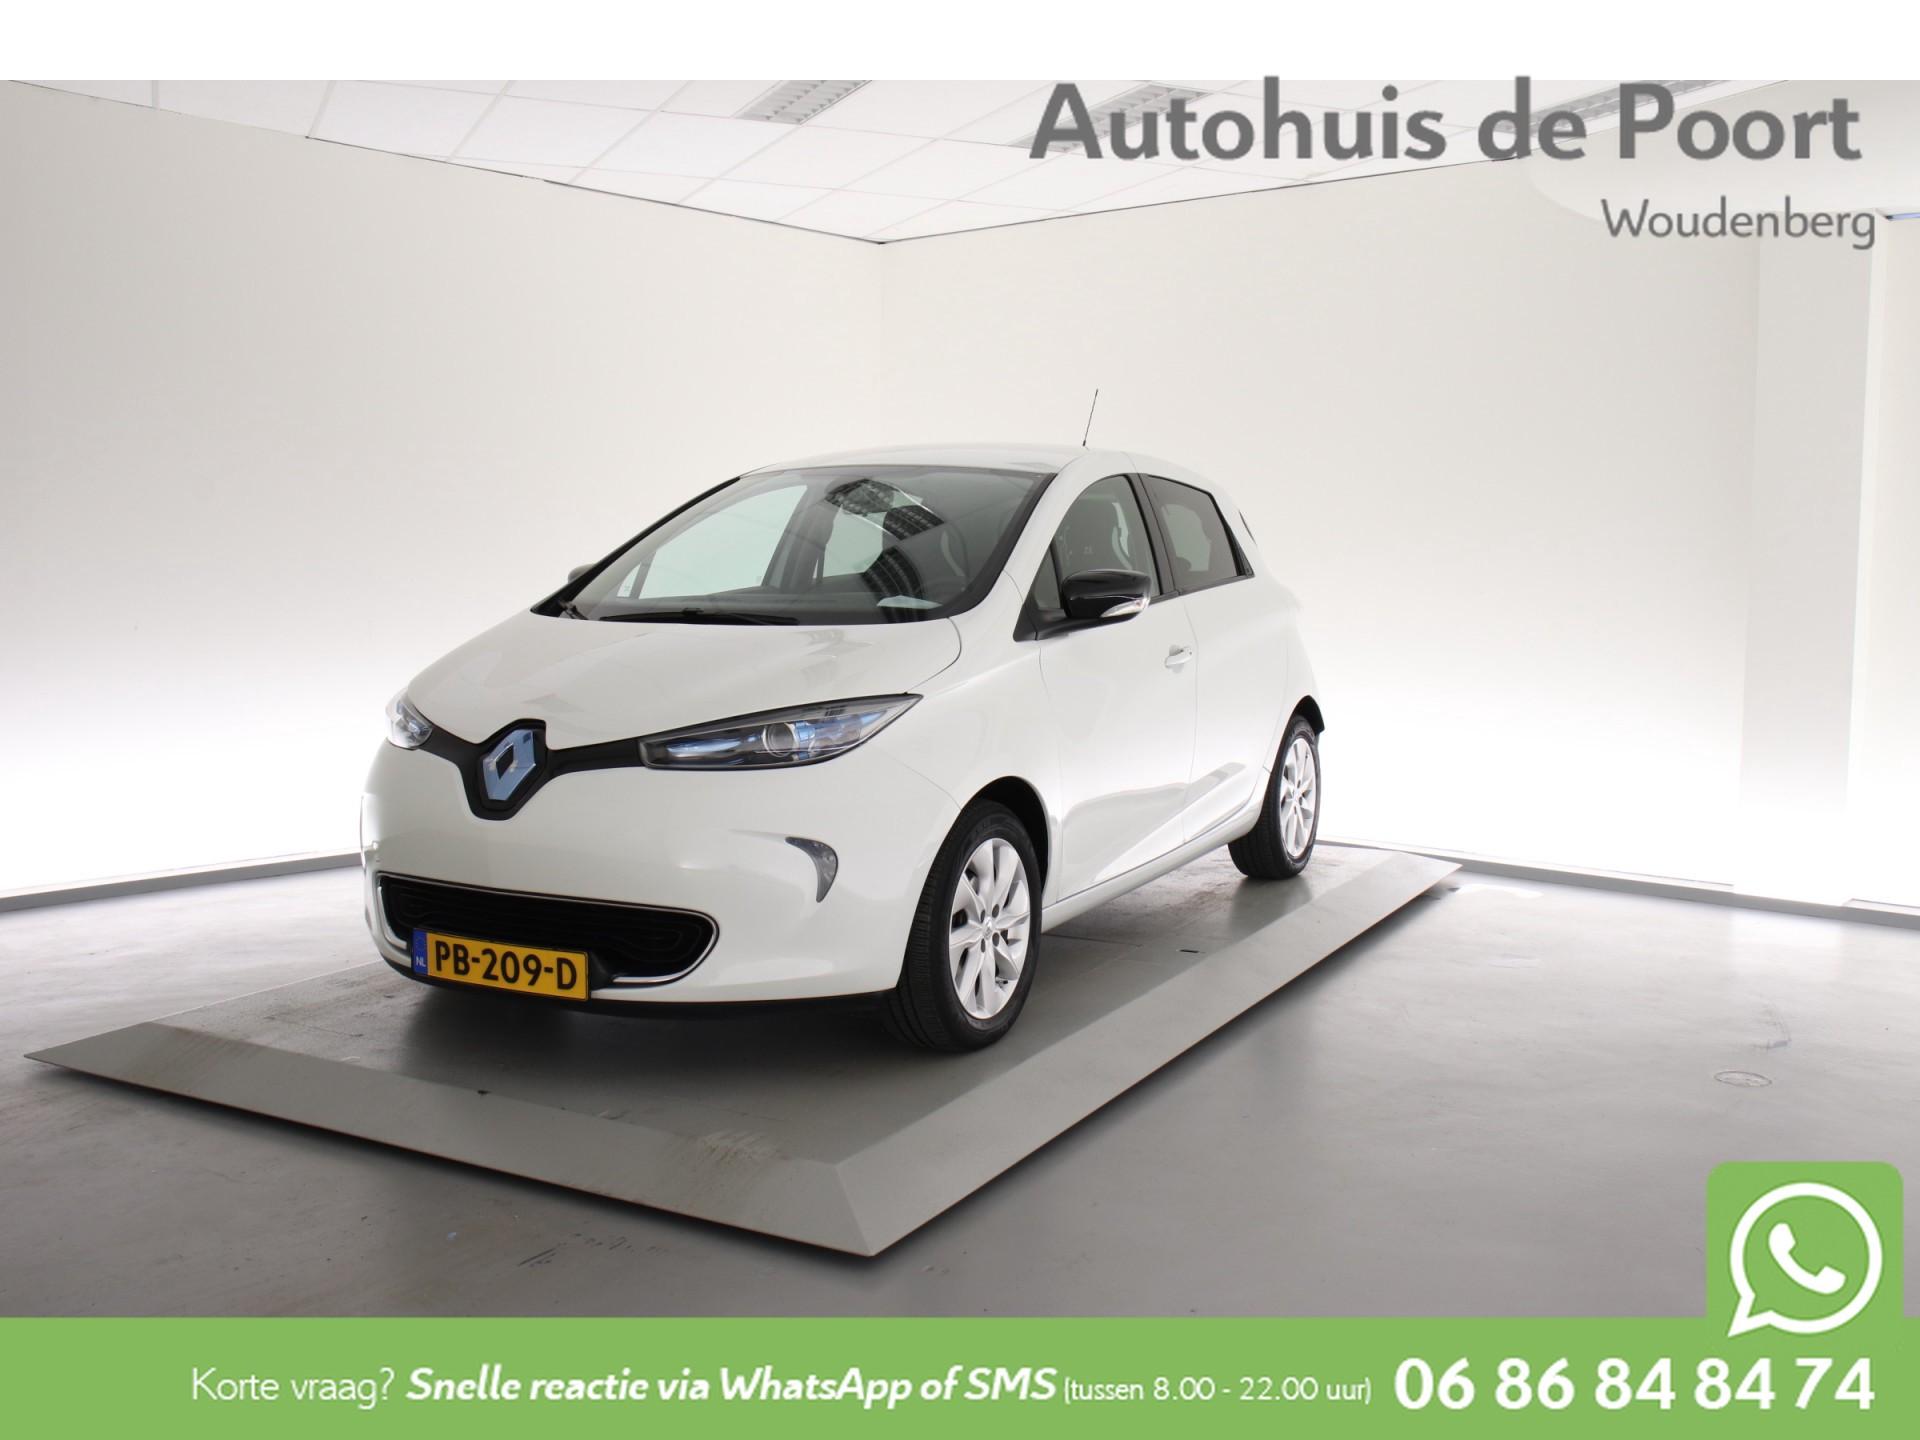 RenaultZoe - R240 Intens 22 kWh Incl. BTW